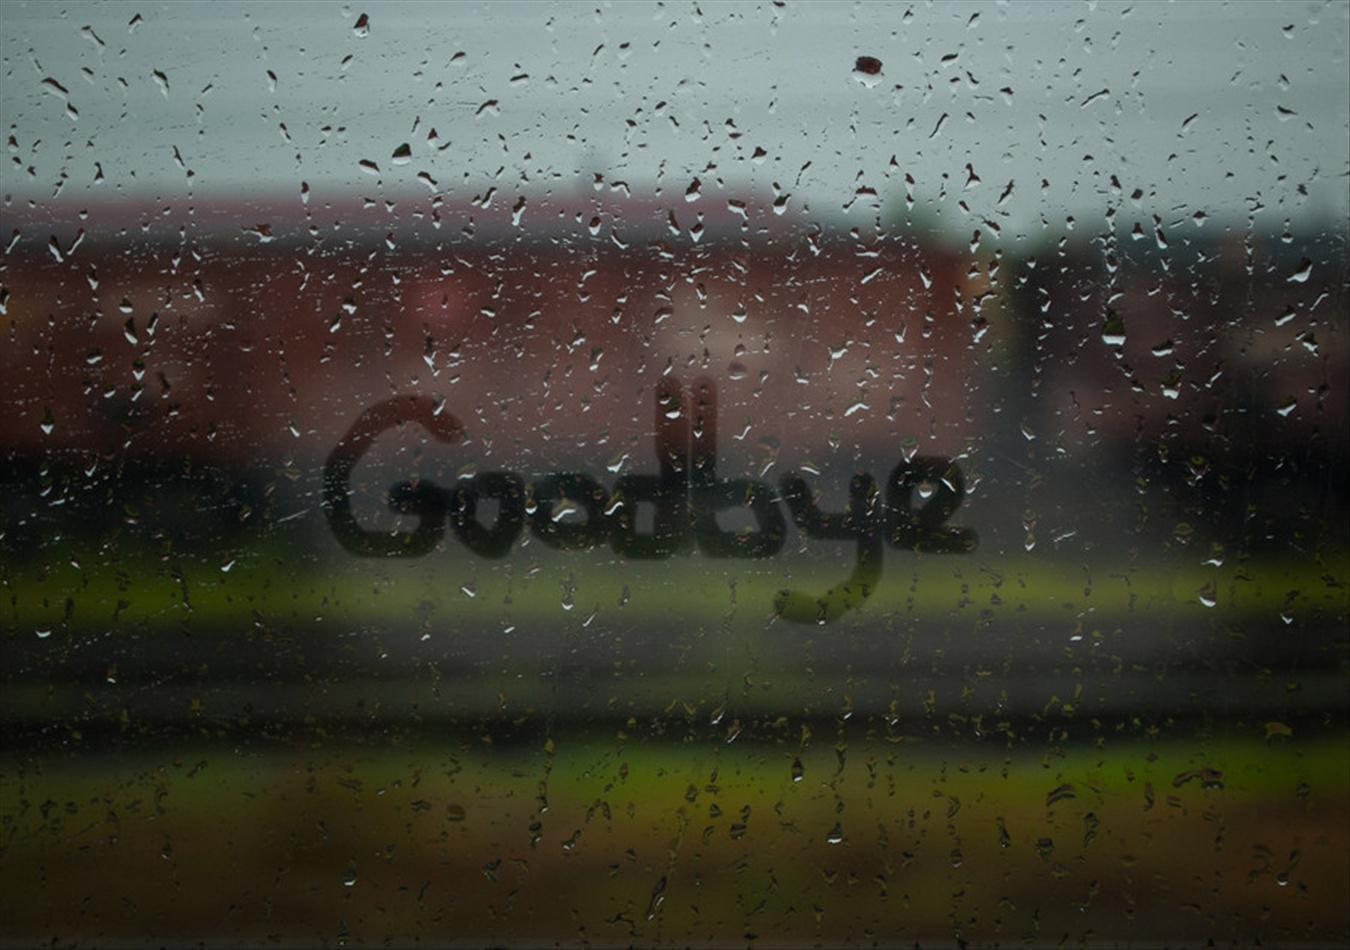 goodbye rain window All Things Next 1350x950